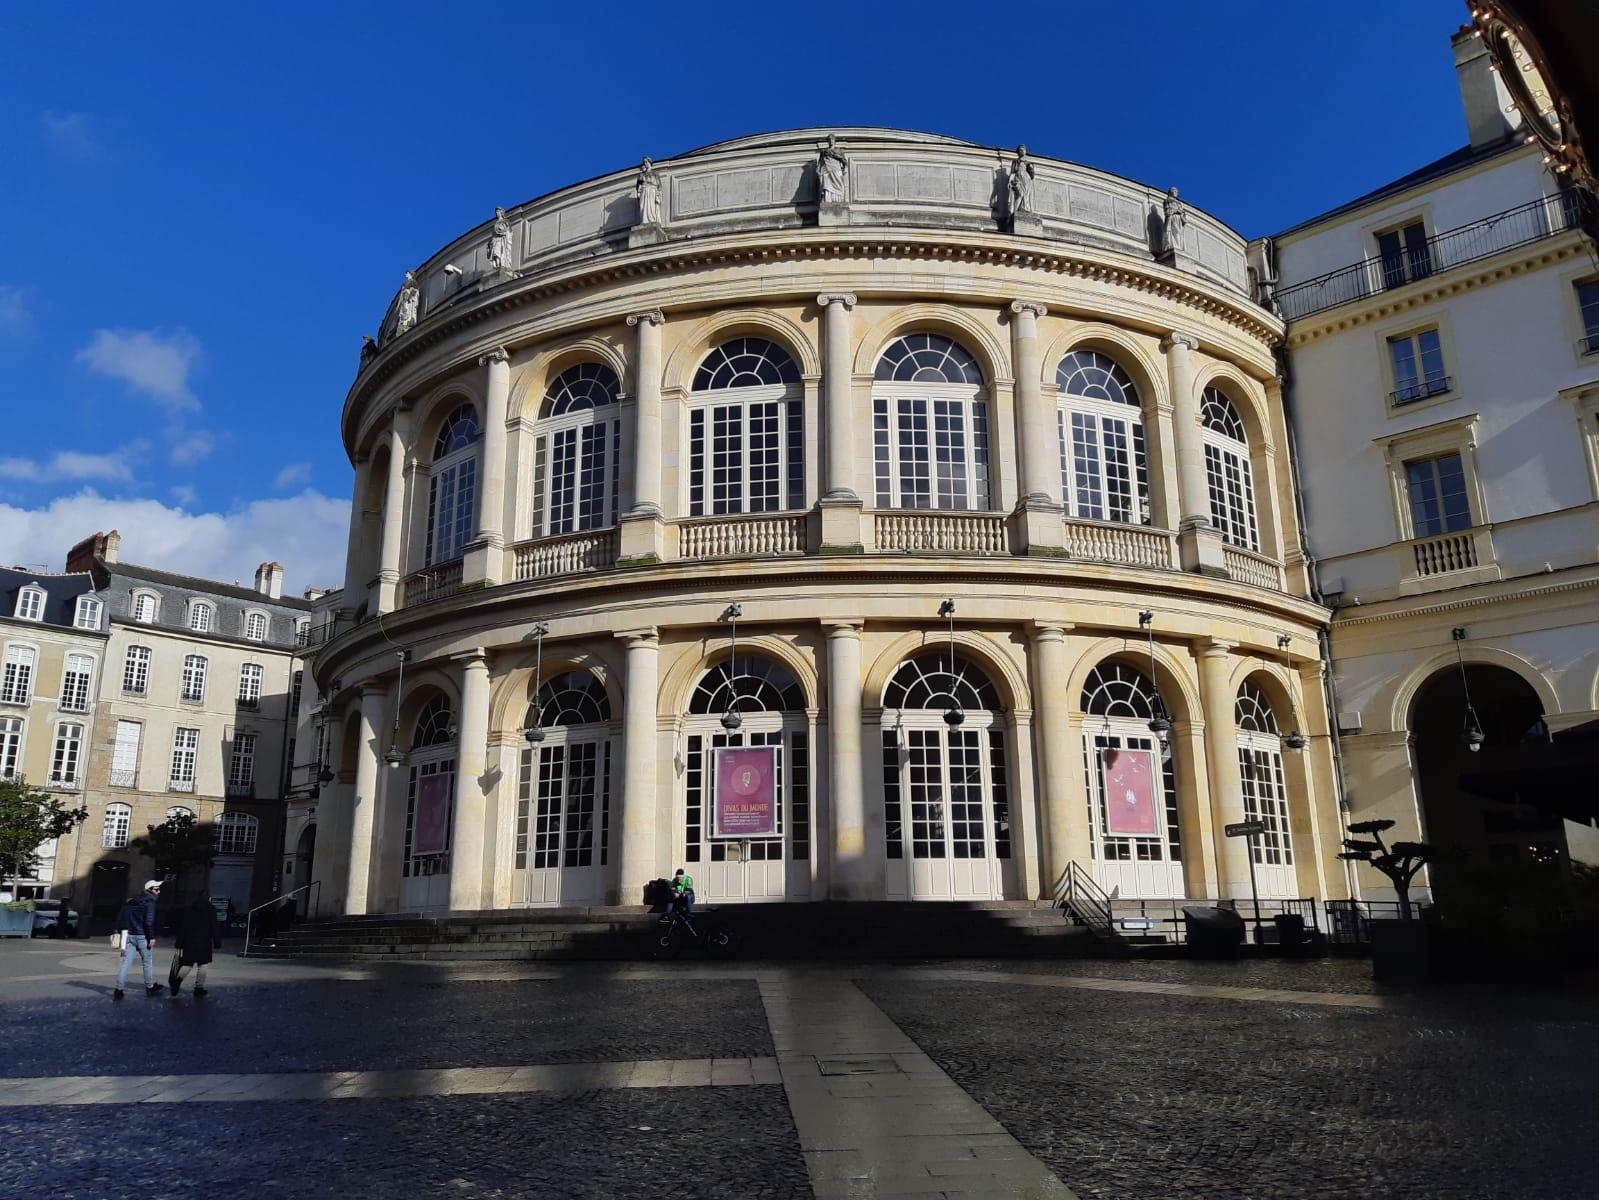 Opera de Rennes France- Paolo Cavallone, Metamorfosi d'amore